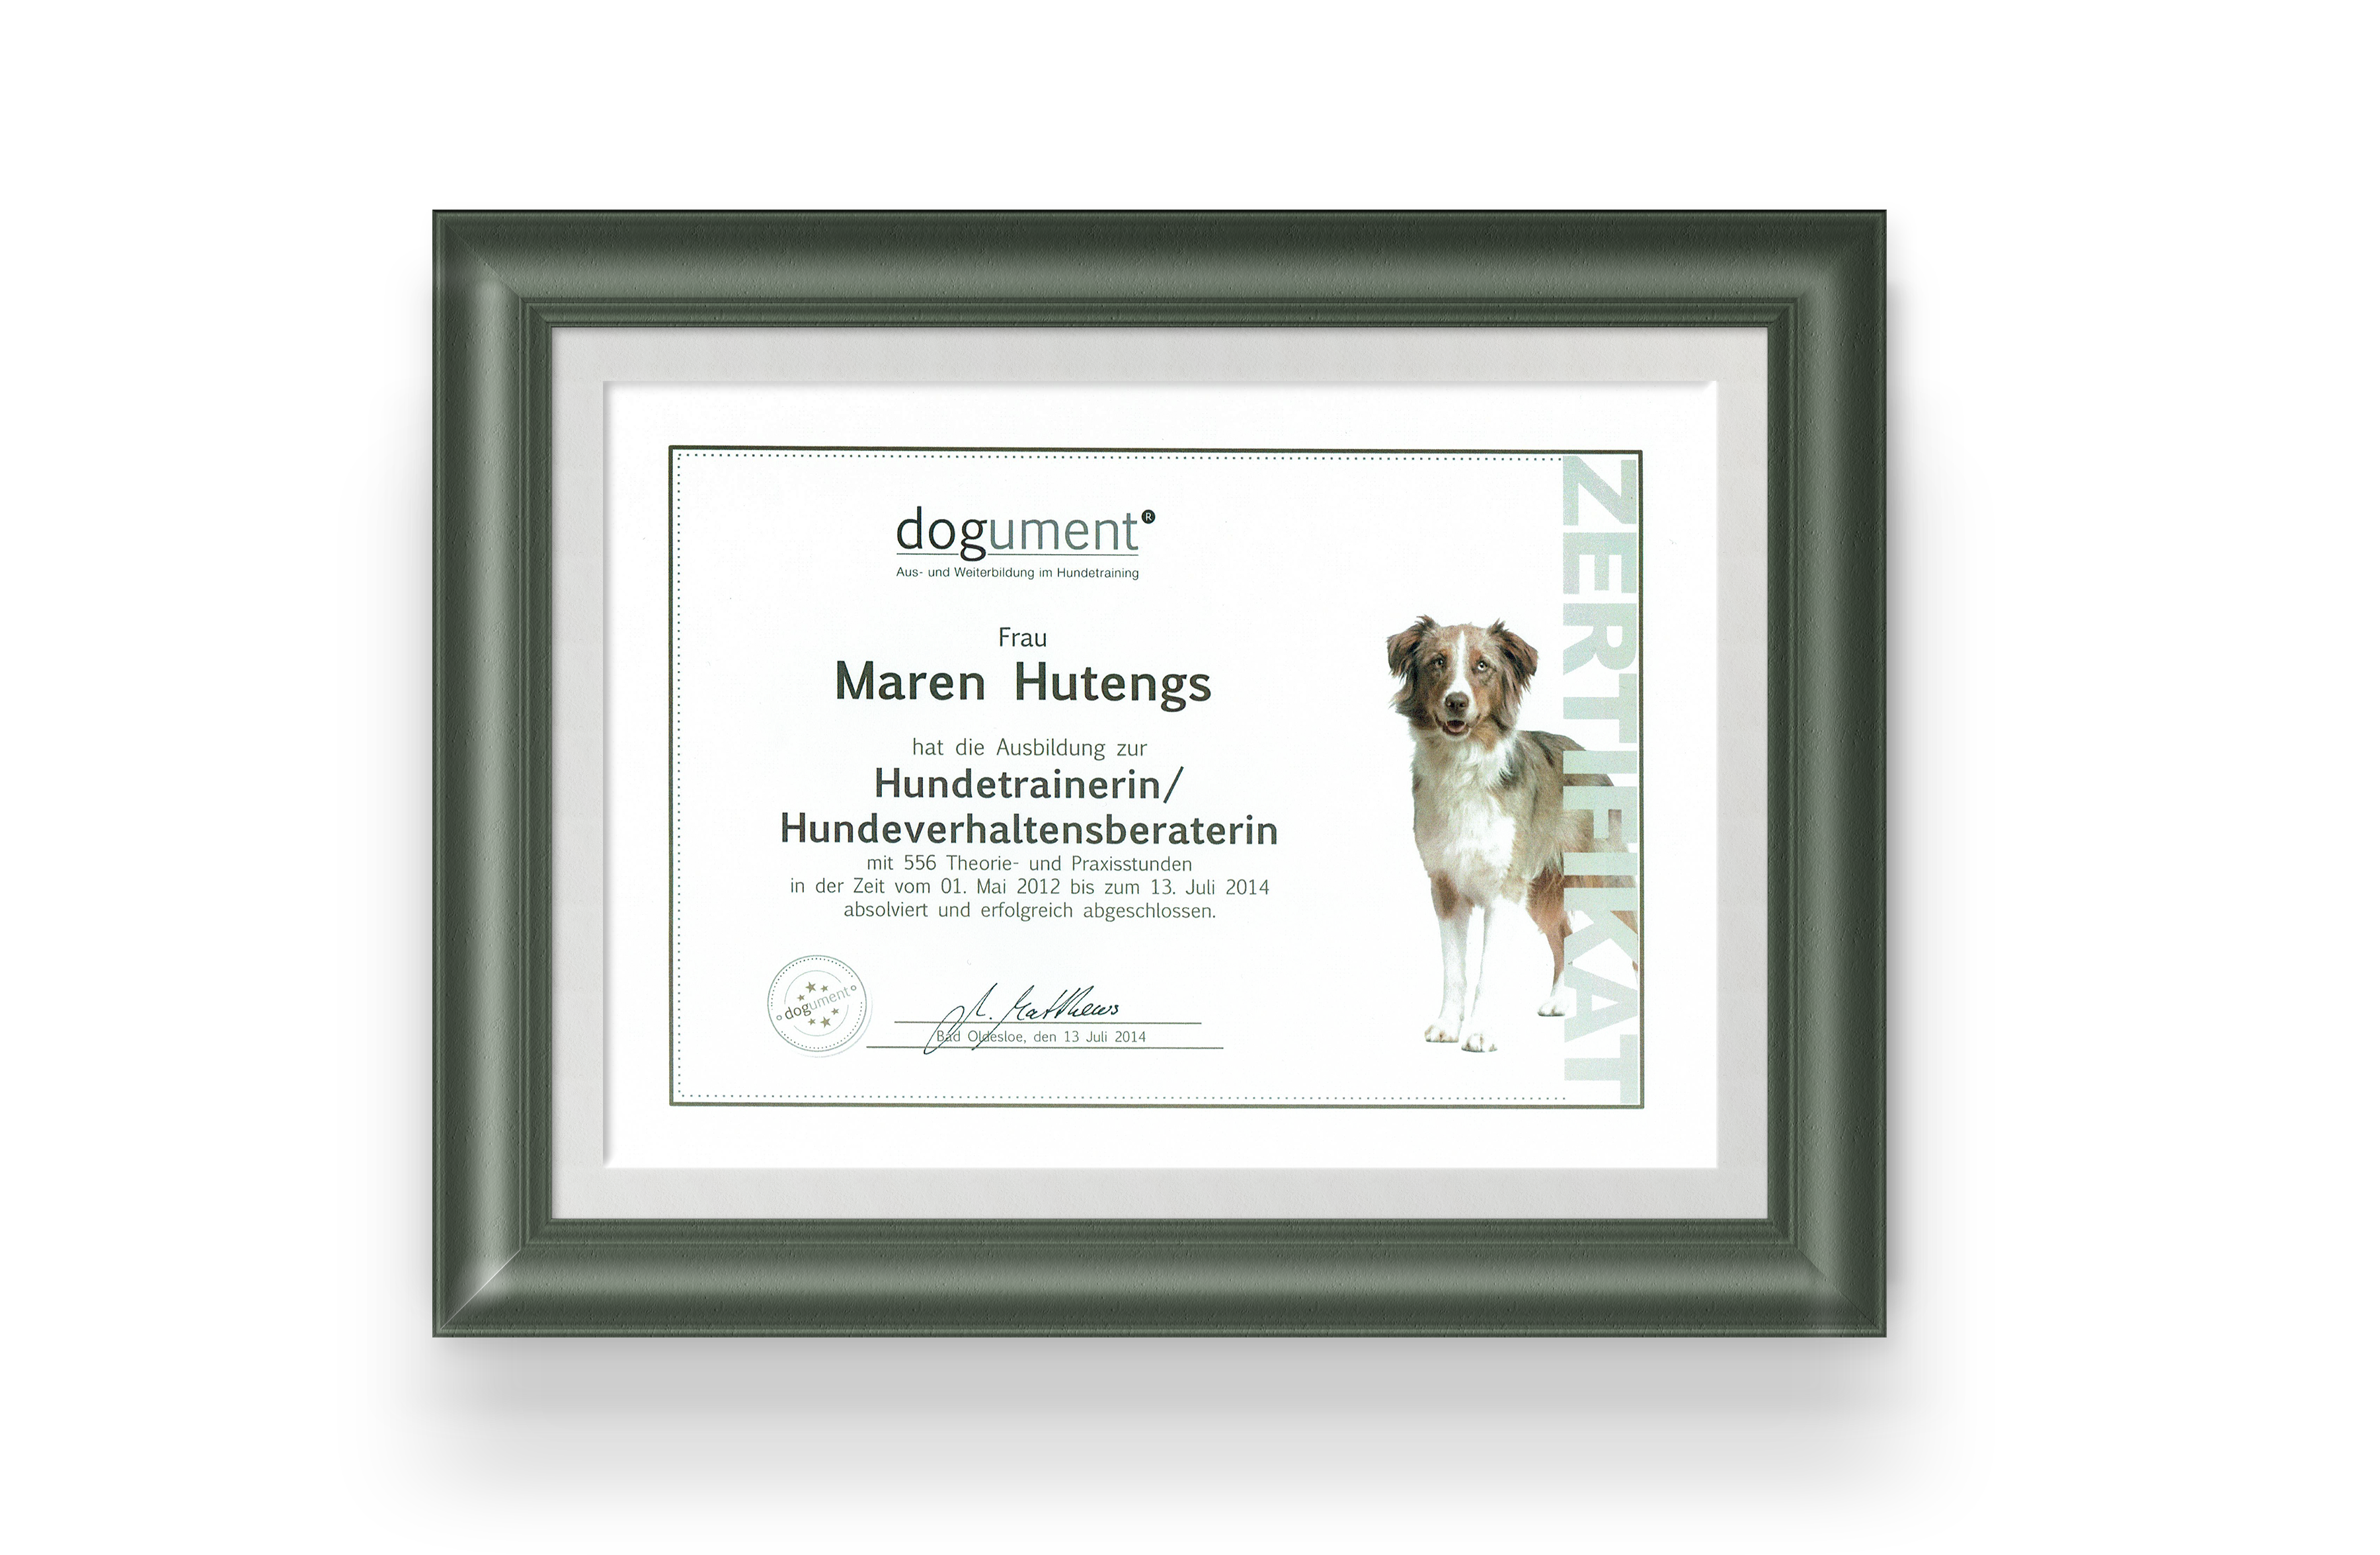 Hundeclique_Frame-Zertifikat